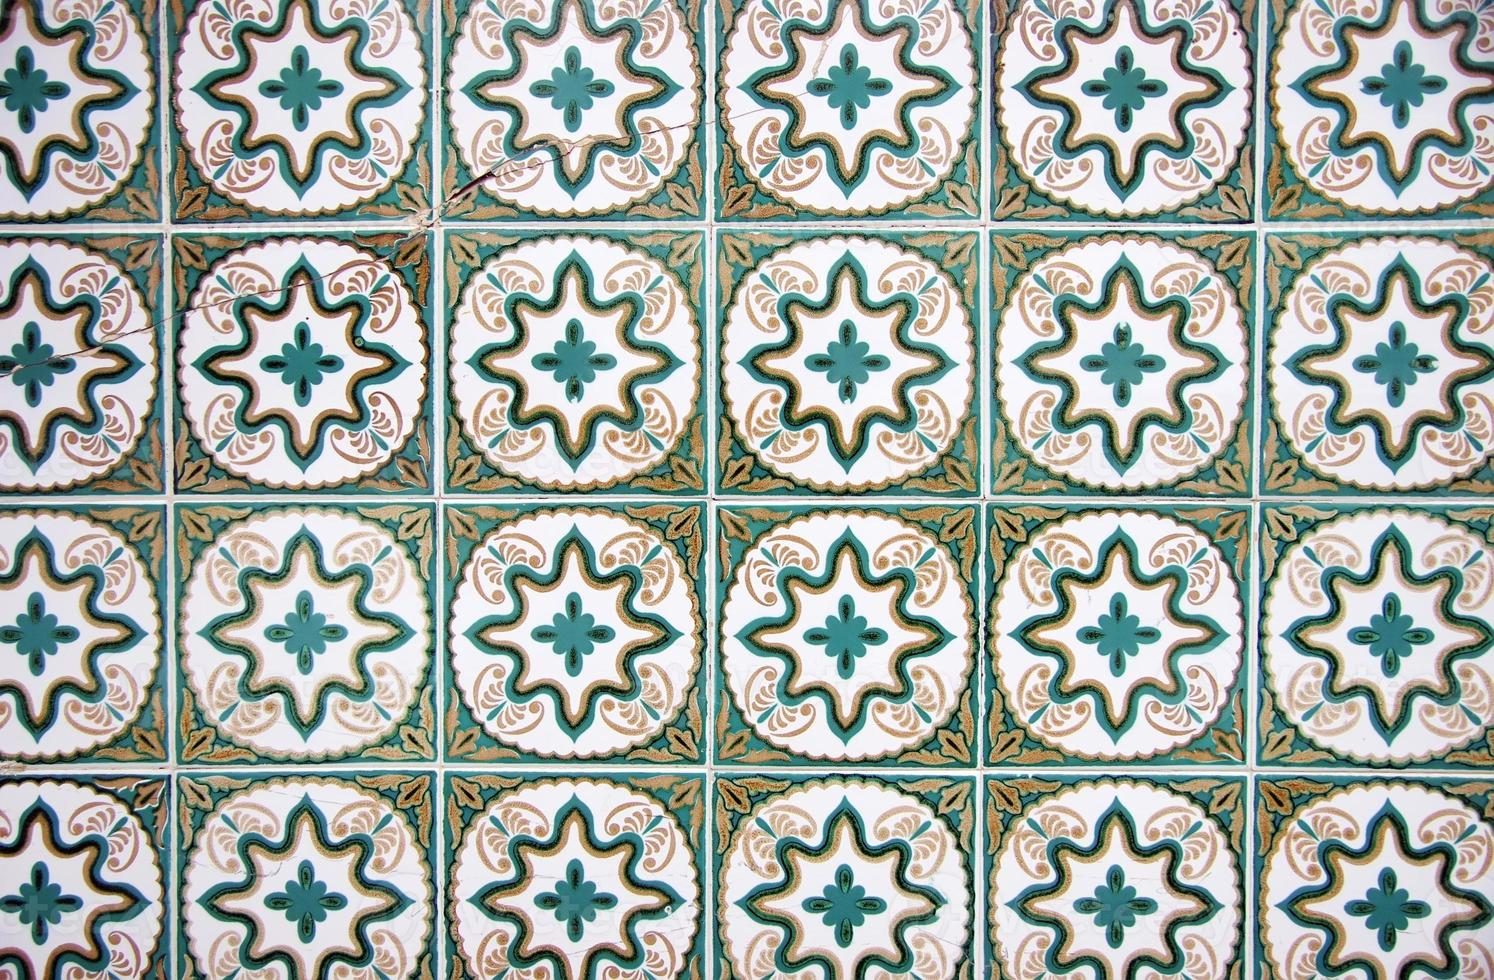 Detalle de azulejos portugueses. foto